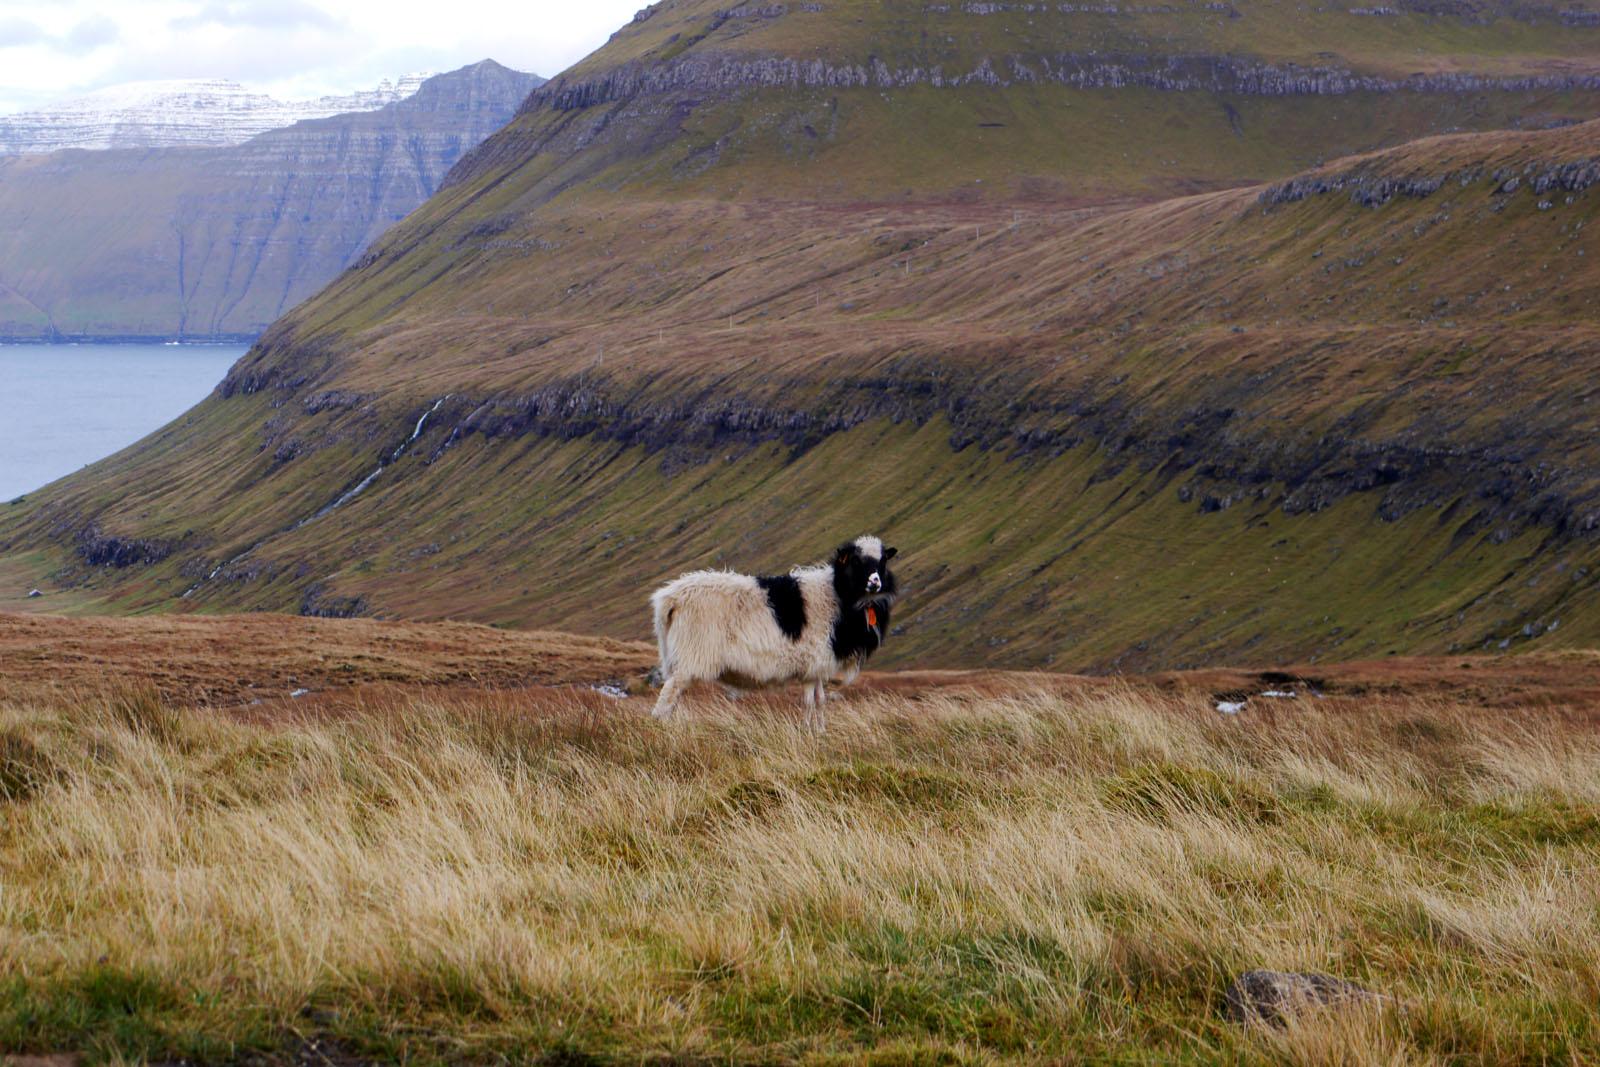 Schaf-Faroer Inseln-Berge